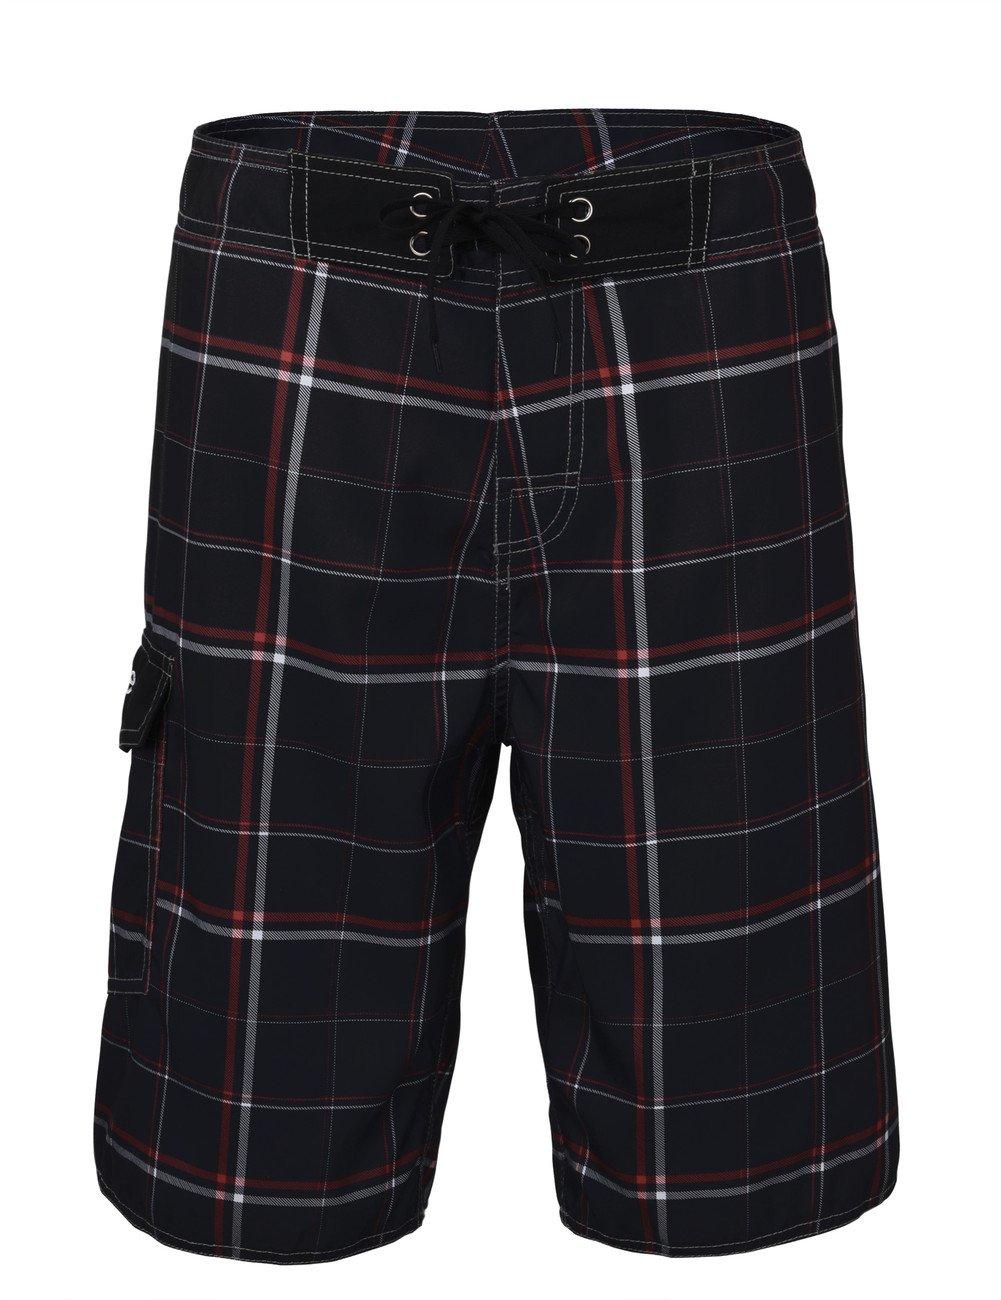 Nonwe Men's Beachwear Quick Dry Plaid Pattern Swim Shorts Black 34